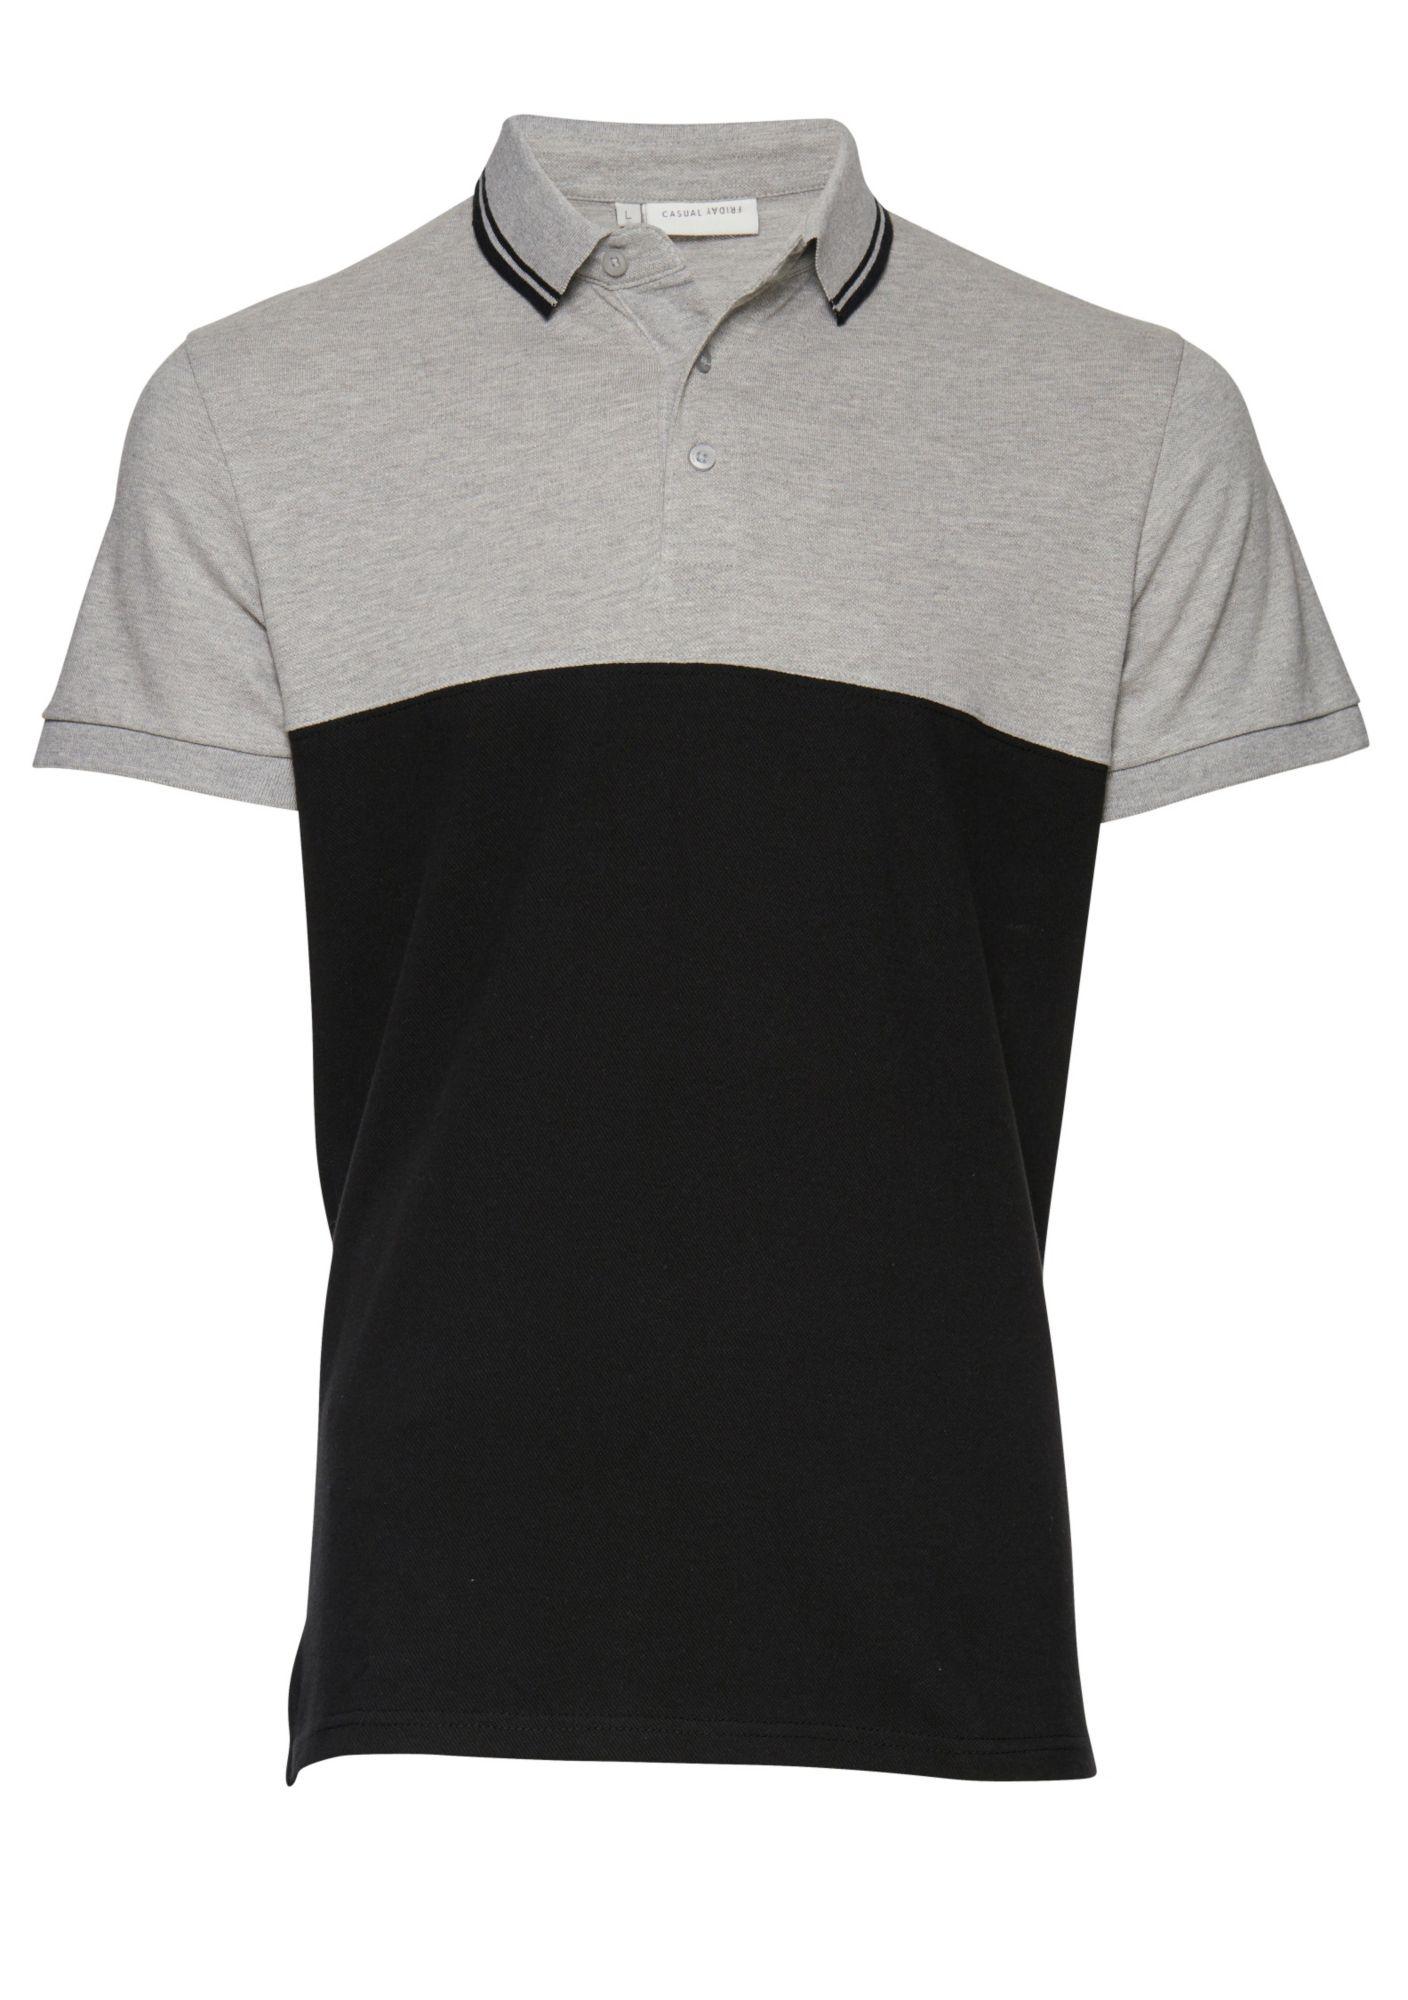 CASUAL FRIDAY Casual Friday Poloshirts (kurzarm)